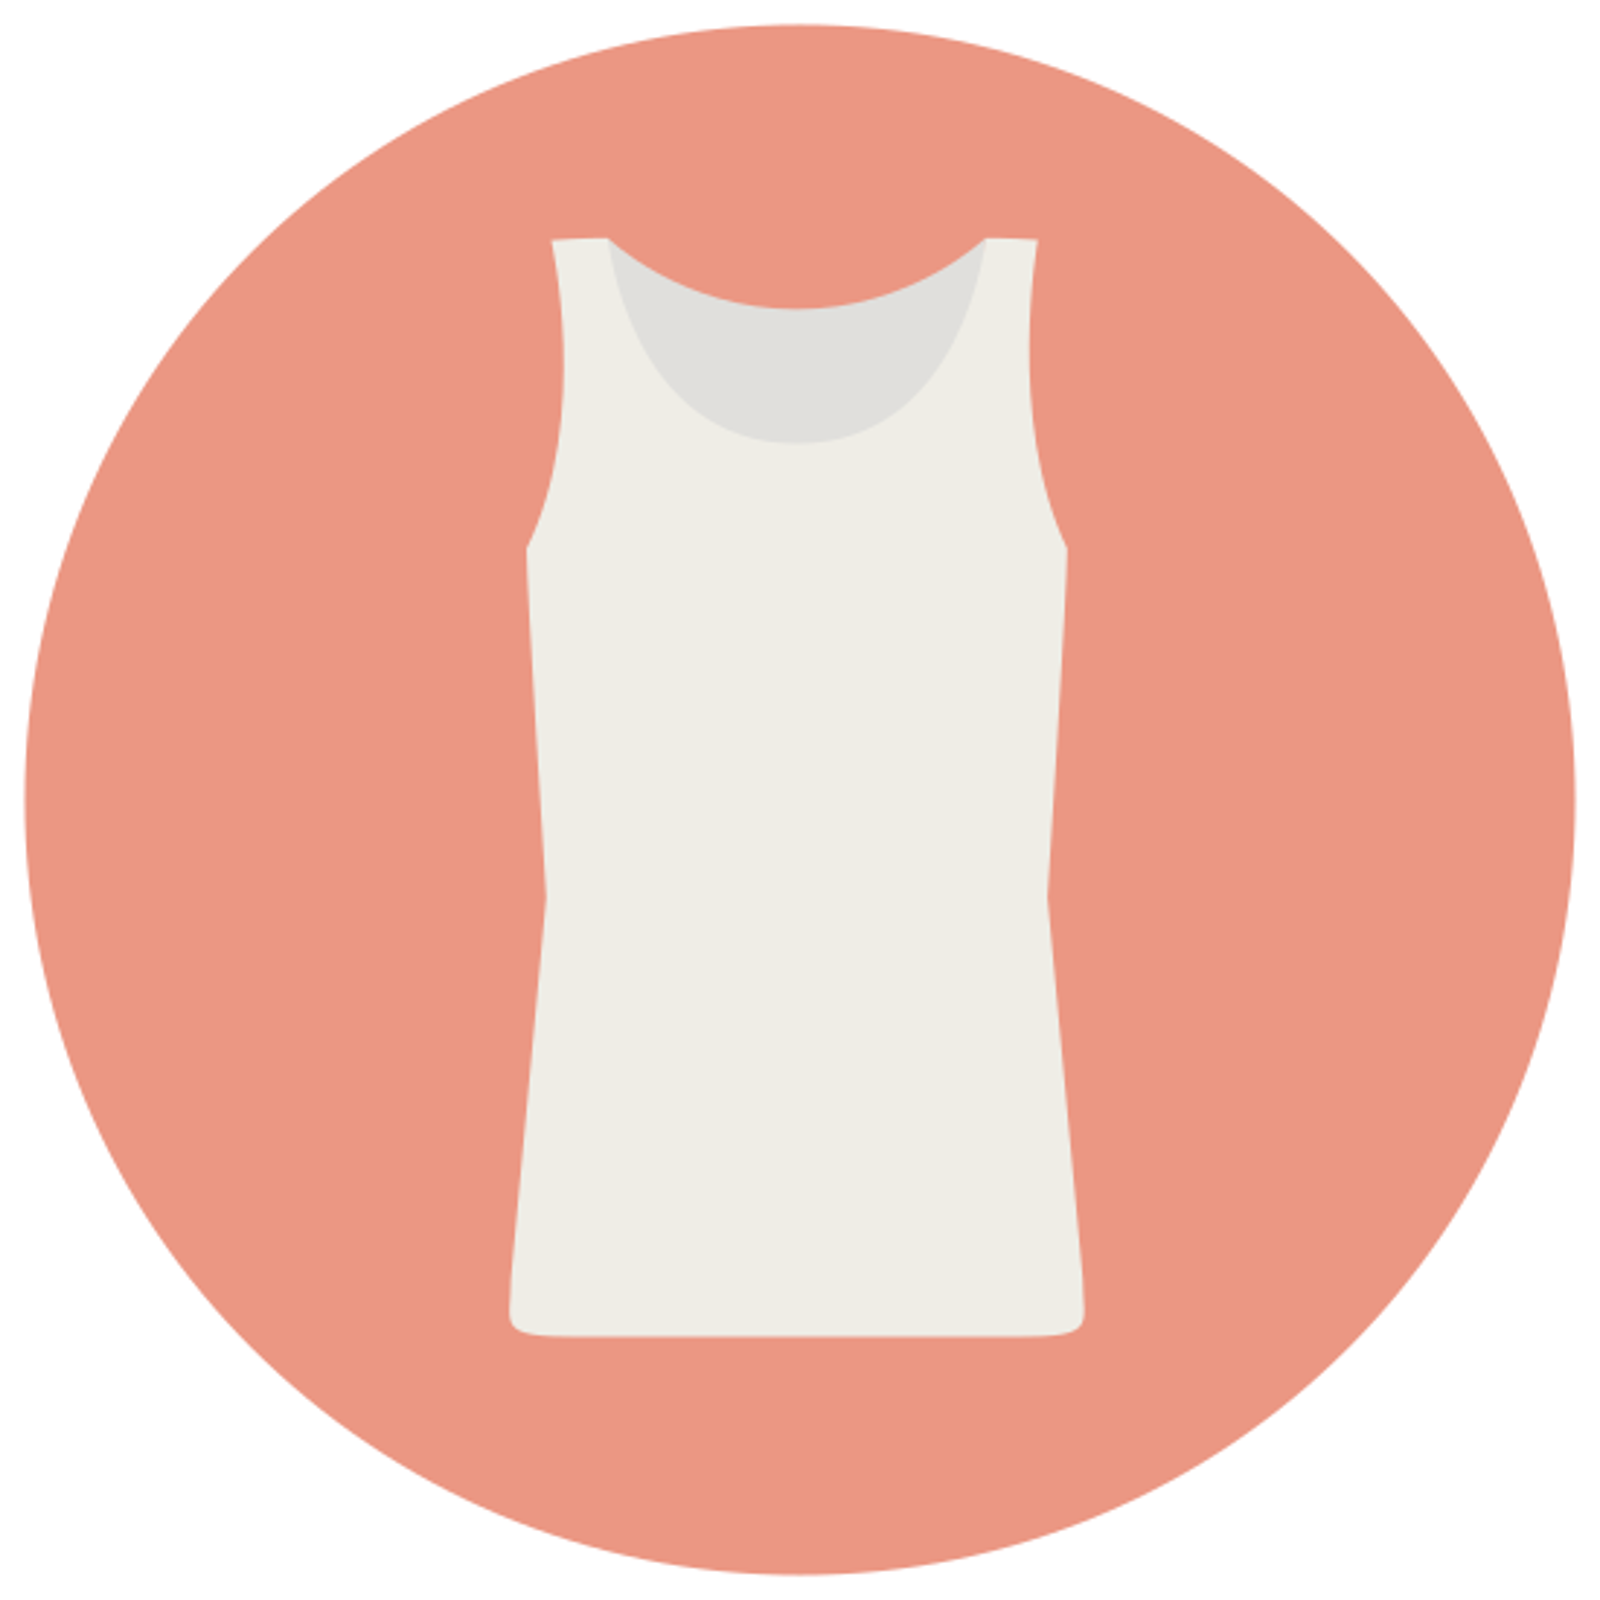 Undershirt icon